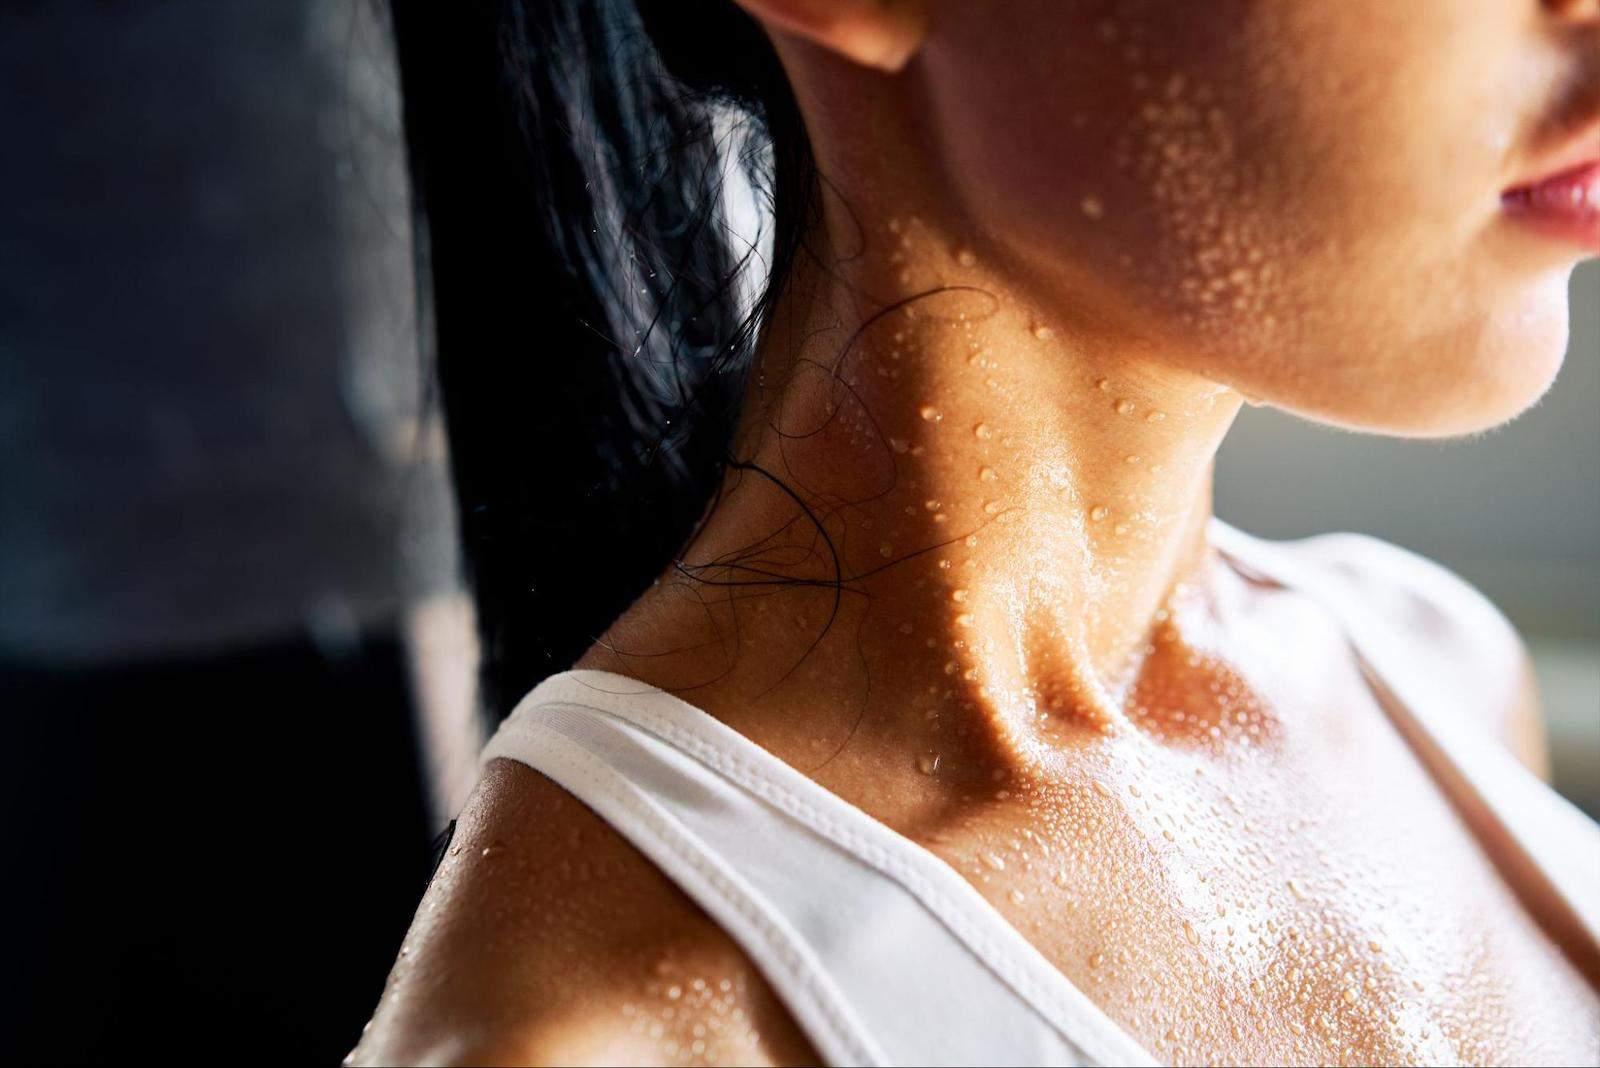 infrared sauna benefits and disadvantages: woman perspiring